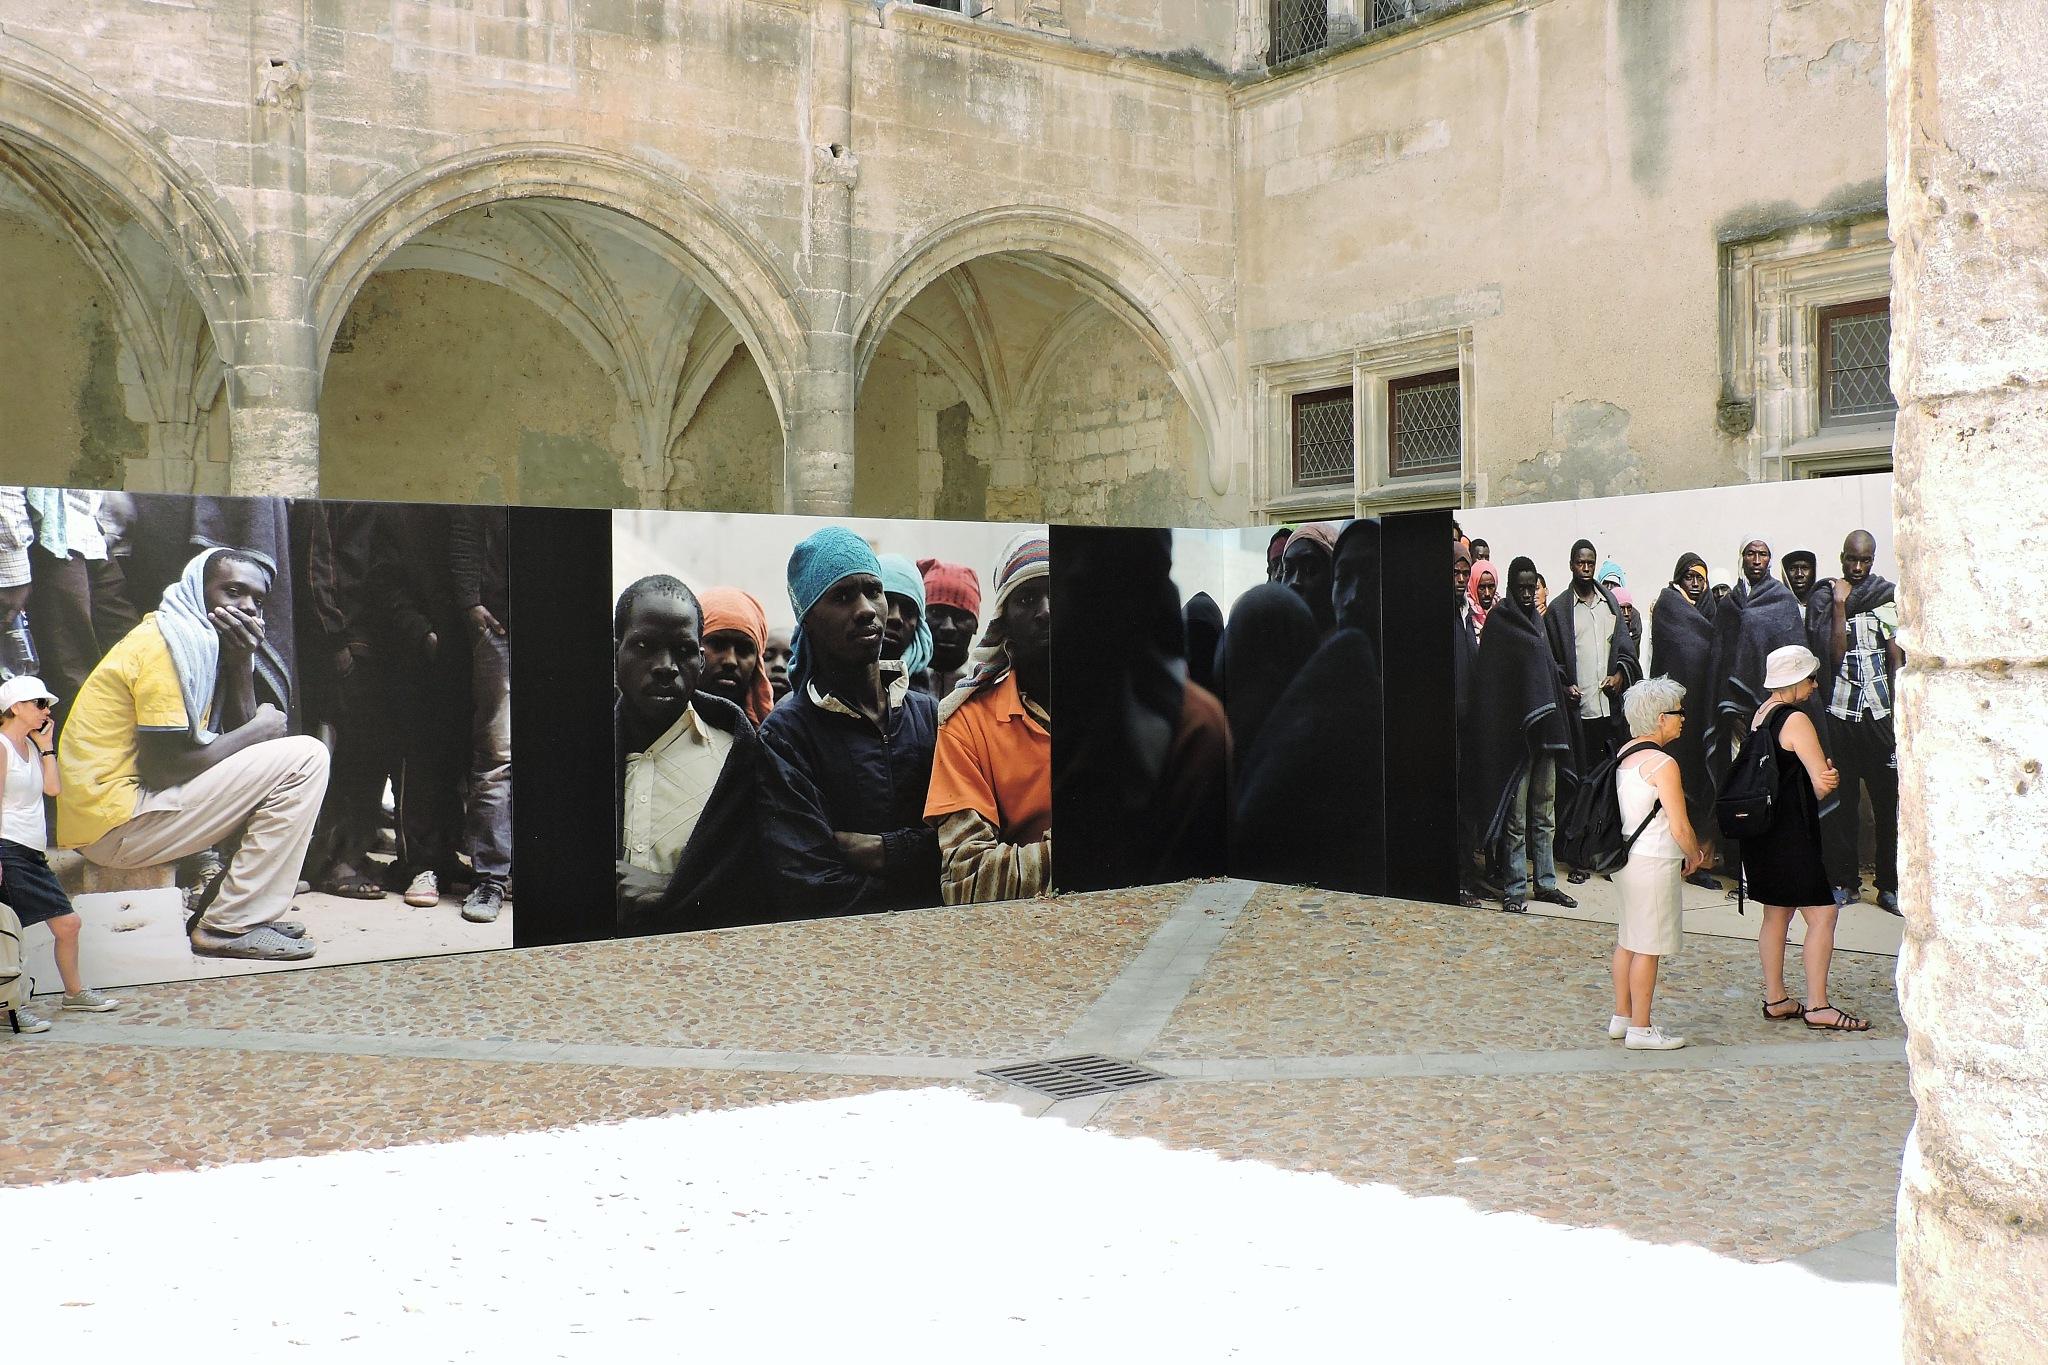 Samuel Gratacap, Fifty-fifty | Les Rencontres de la photographie, Arles. by Ana Botelho